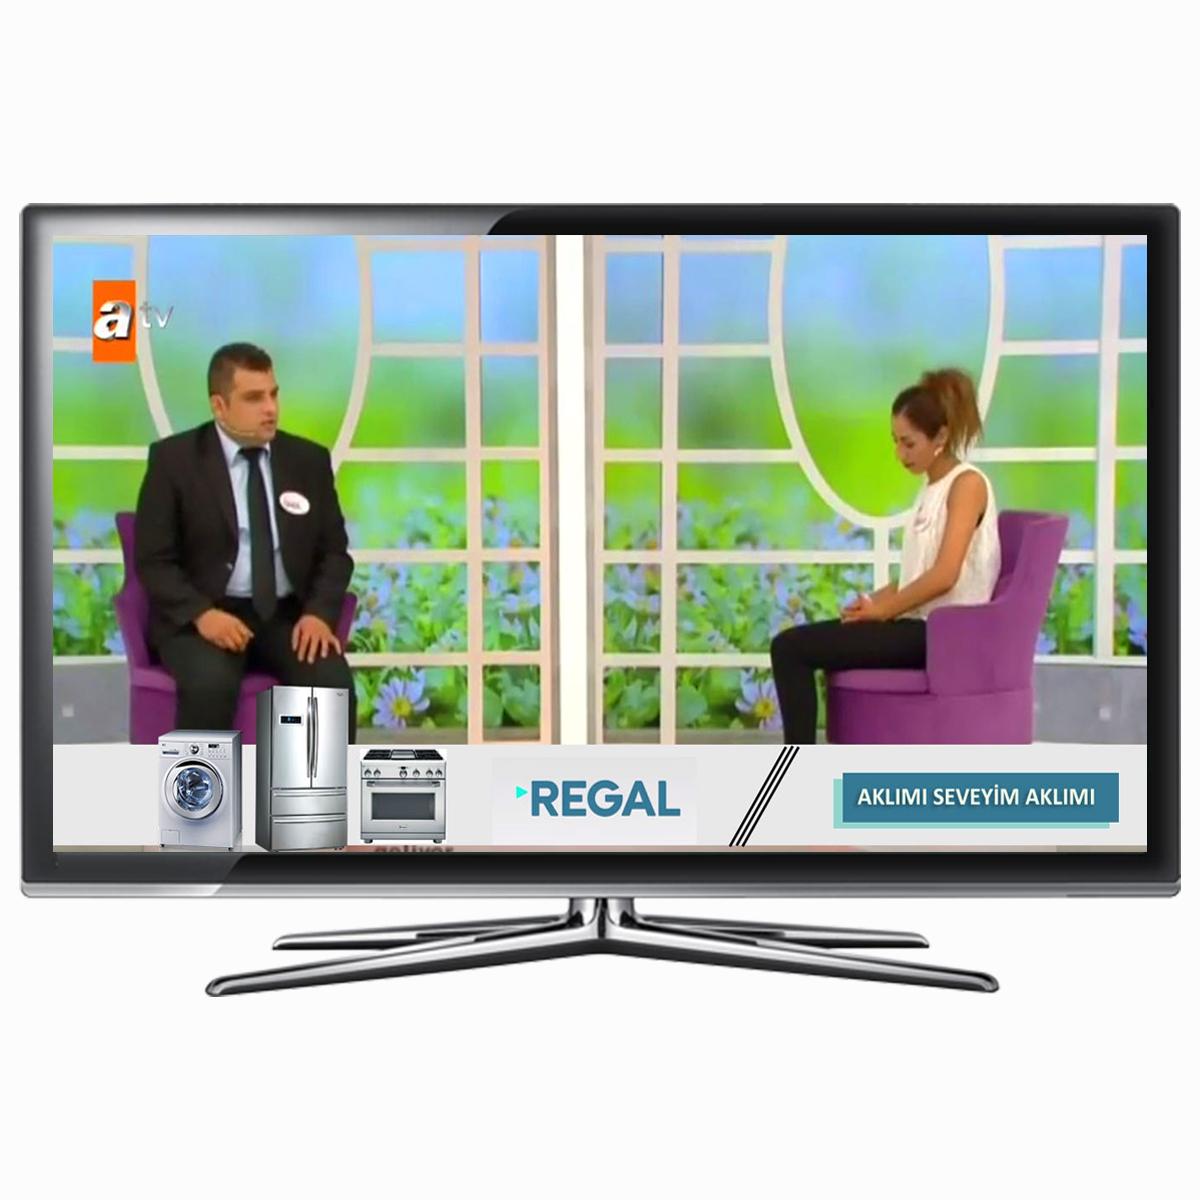 TV bant reklam - medyaatak